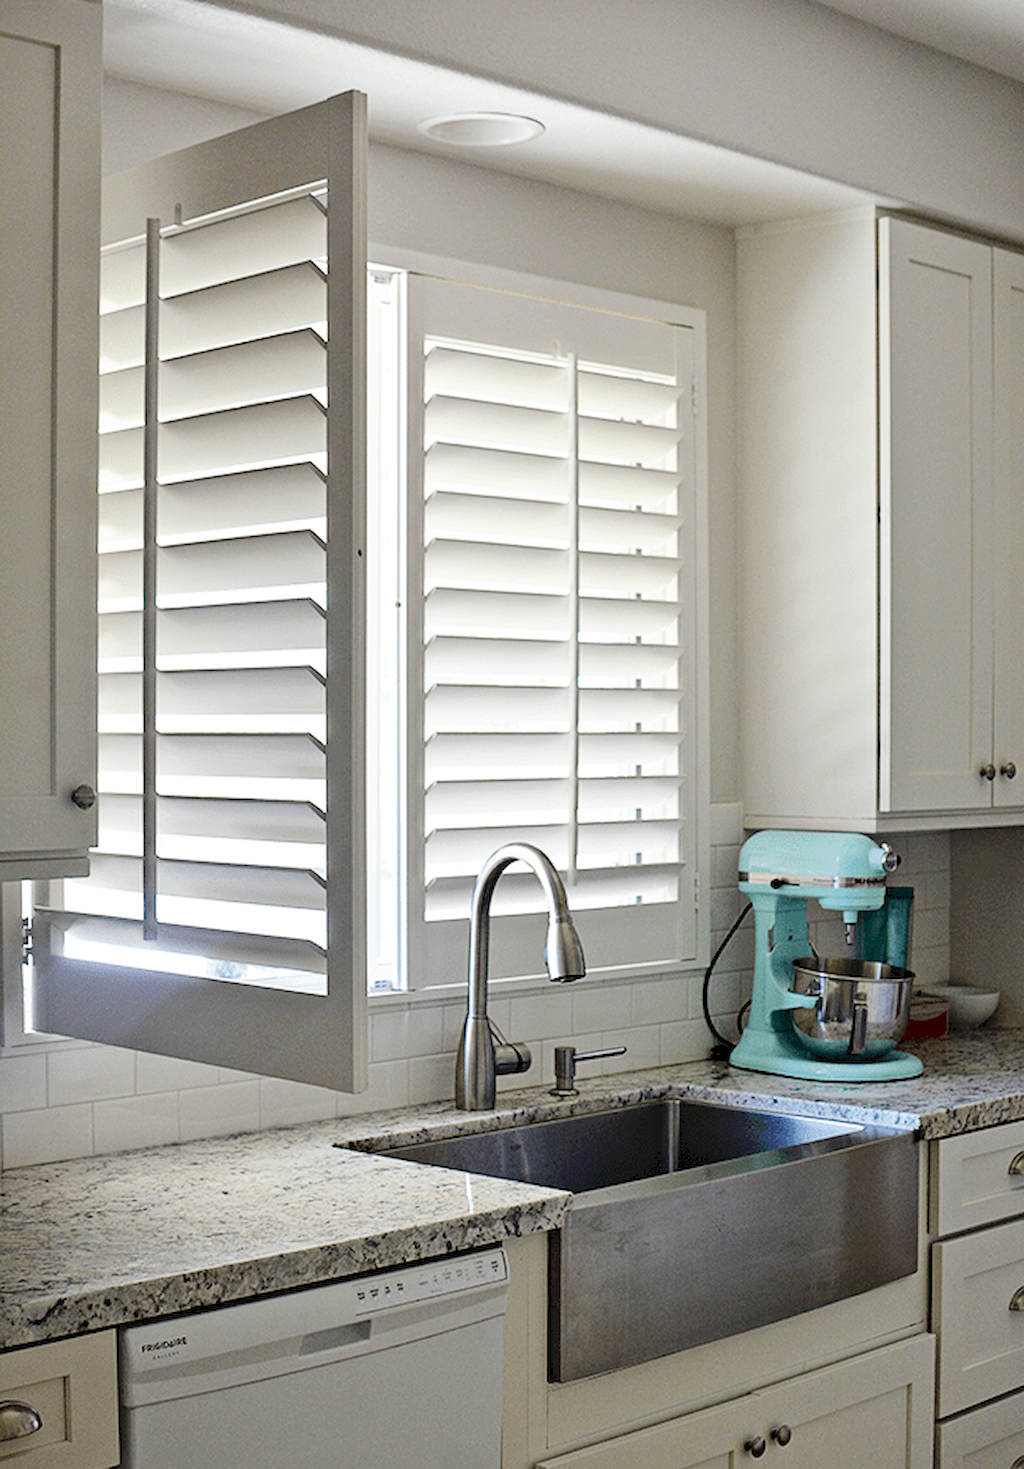 Kitchen Window Treatments Ideas For Less Kitchen window